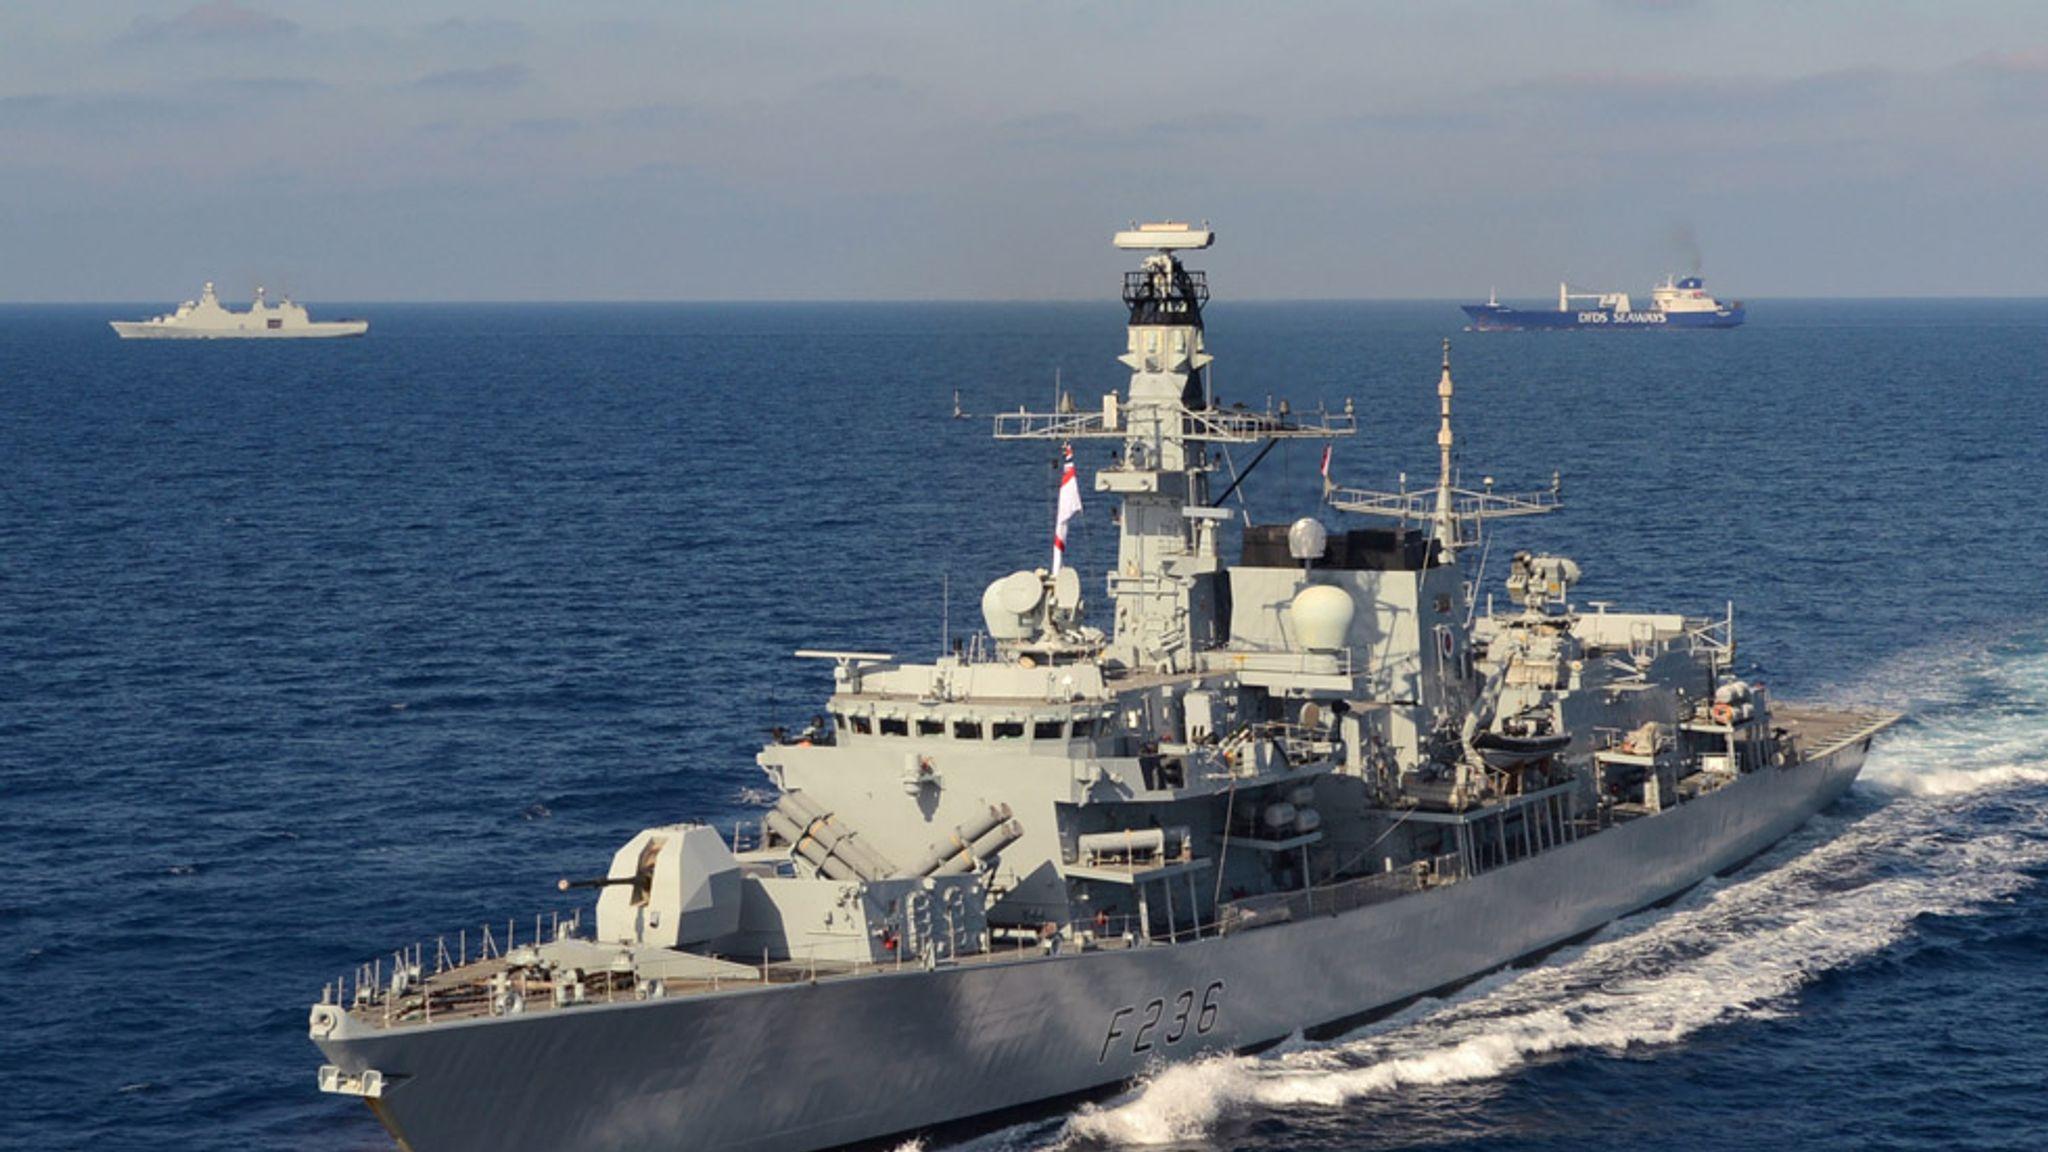 Royal Navy warship shadowing British tanker after Iran threat